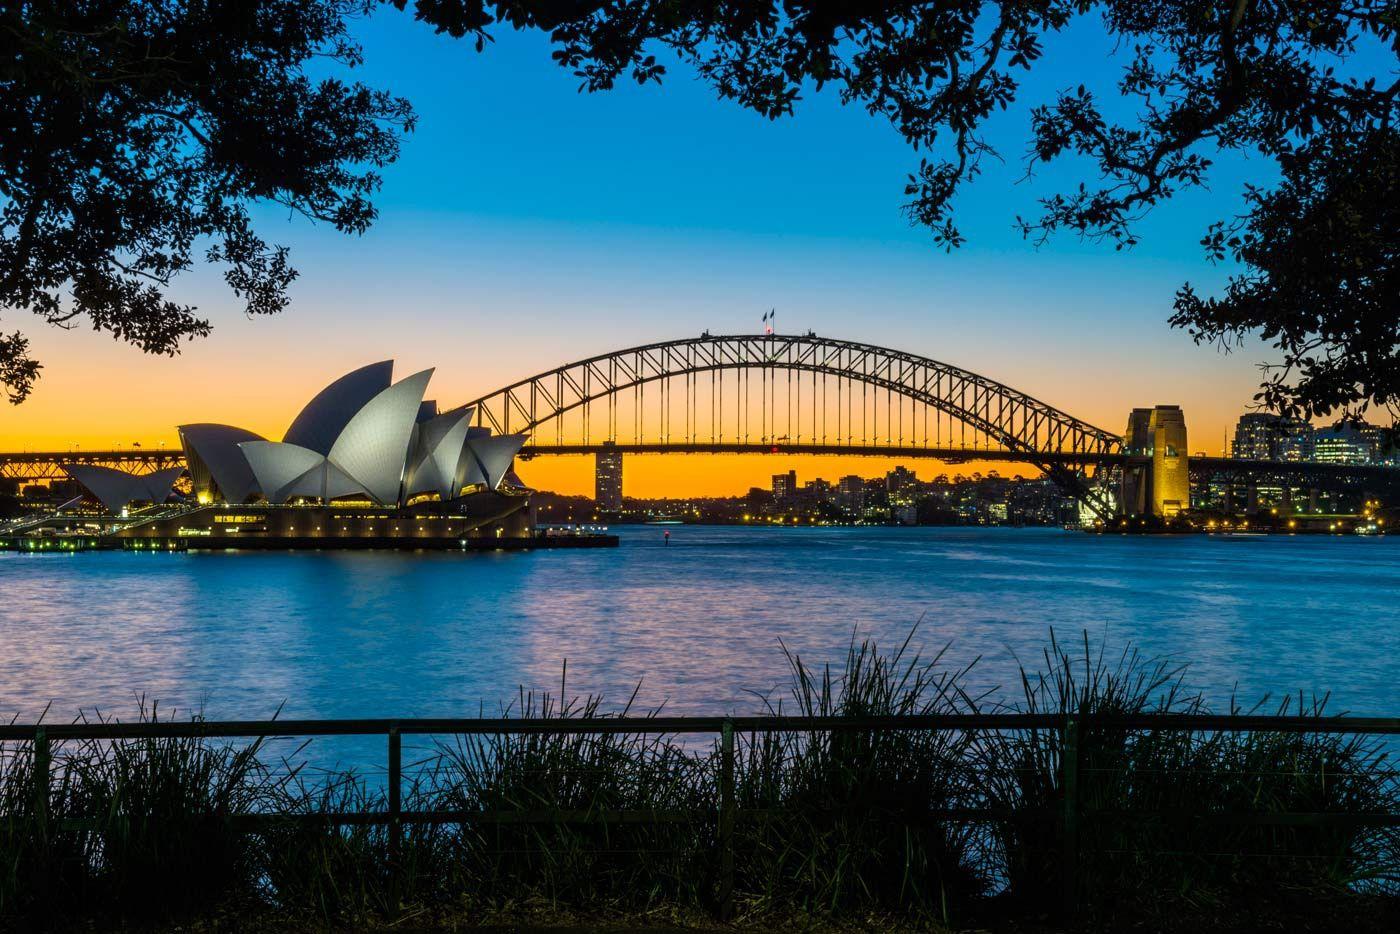 Sídney, Australia - Despiértate en un lugar diferente: